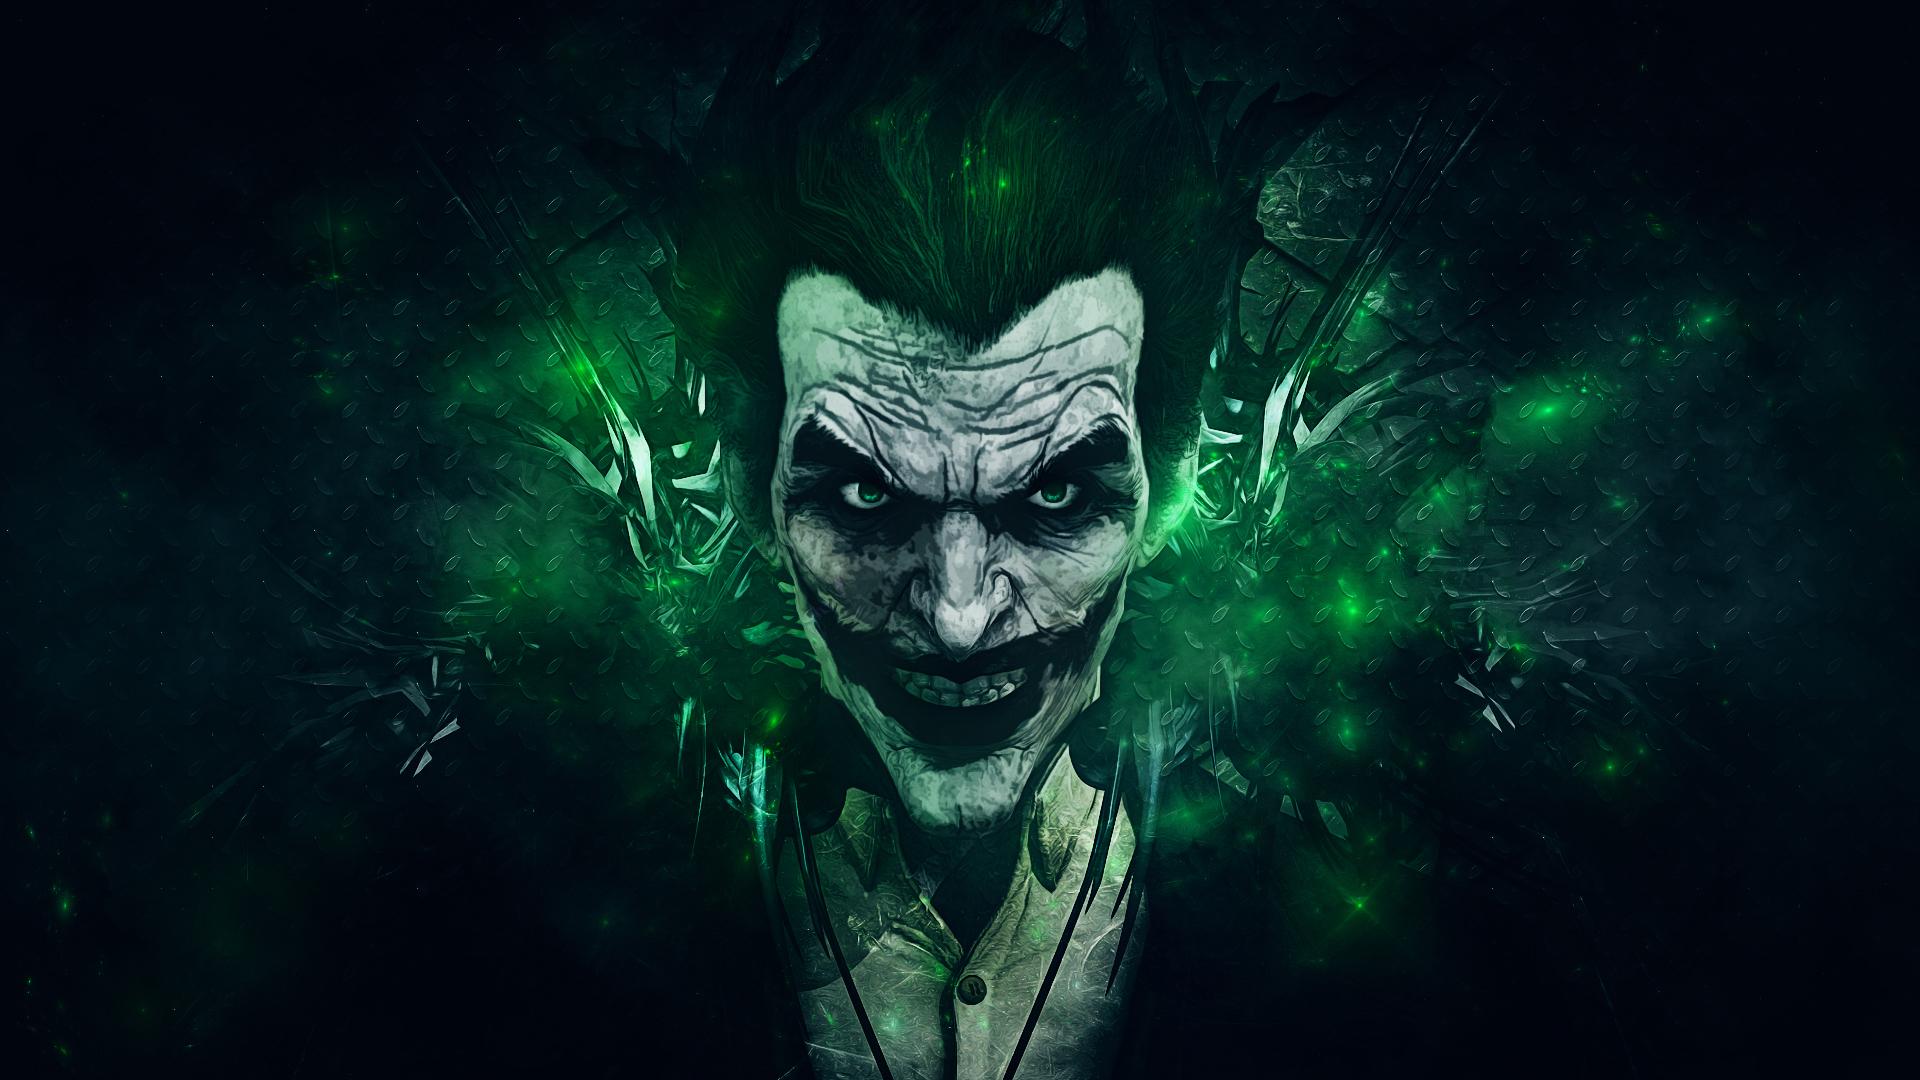 Joker HD Wallpapers 1080p 1920x1080